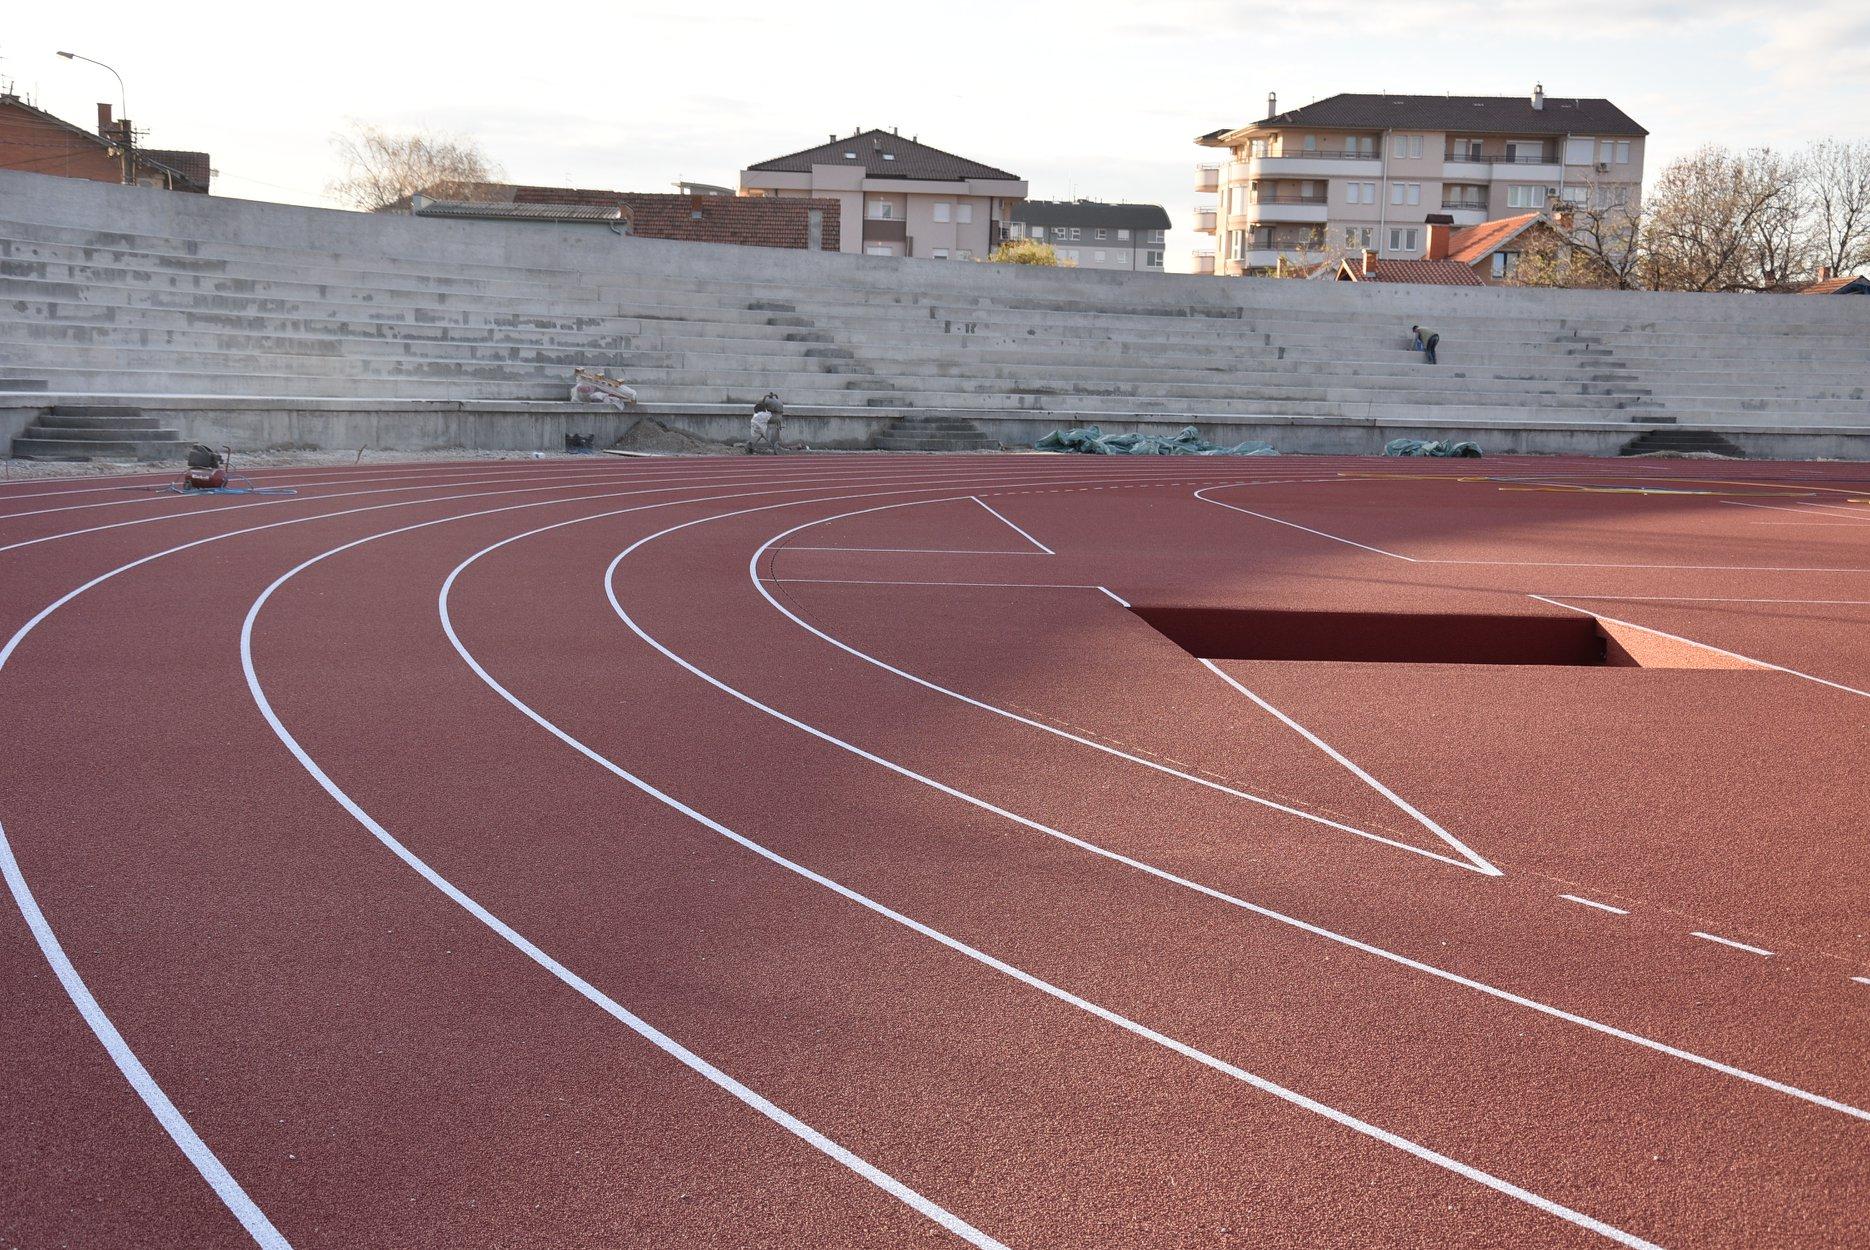 Atletski stadion Ćuprija